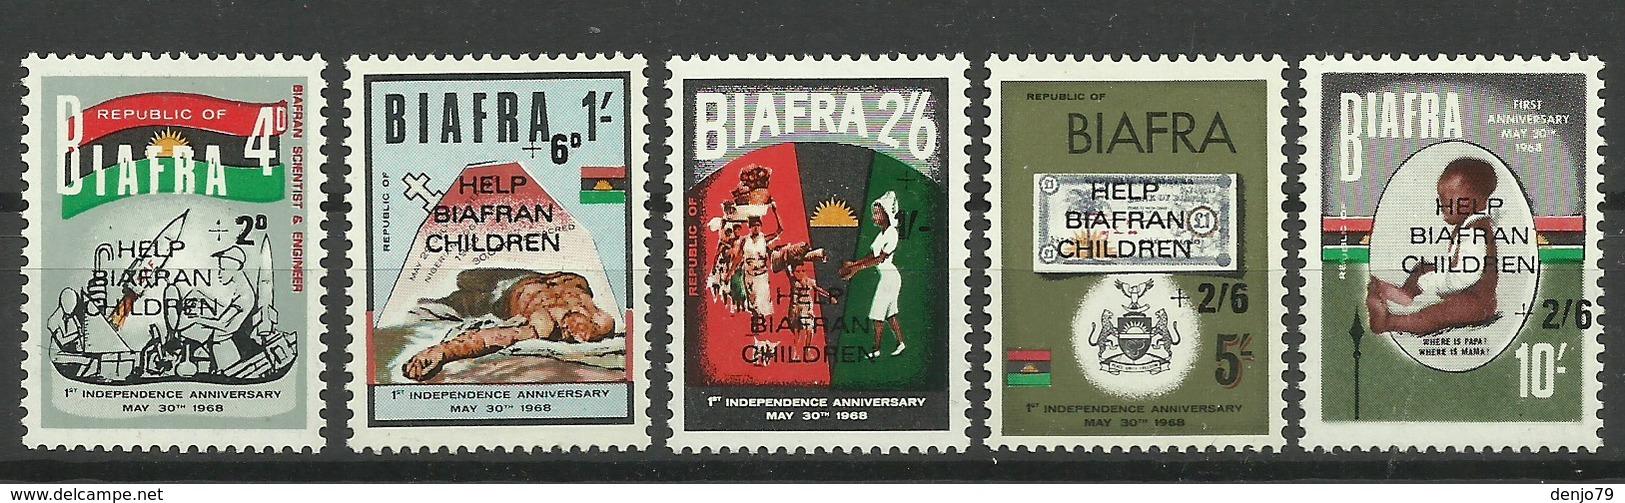 BIAFRA 1970 HELP BIAFRAN CHILDREN OVERPRINTED SET MNH - Postzegels